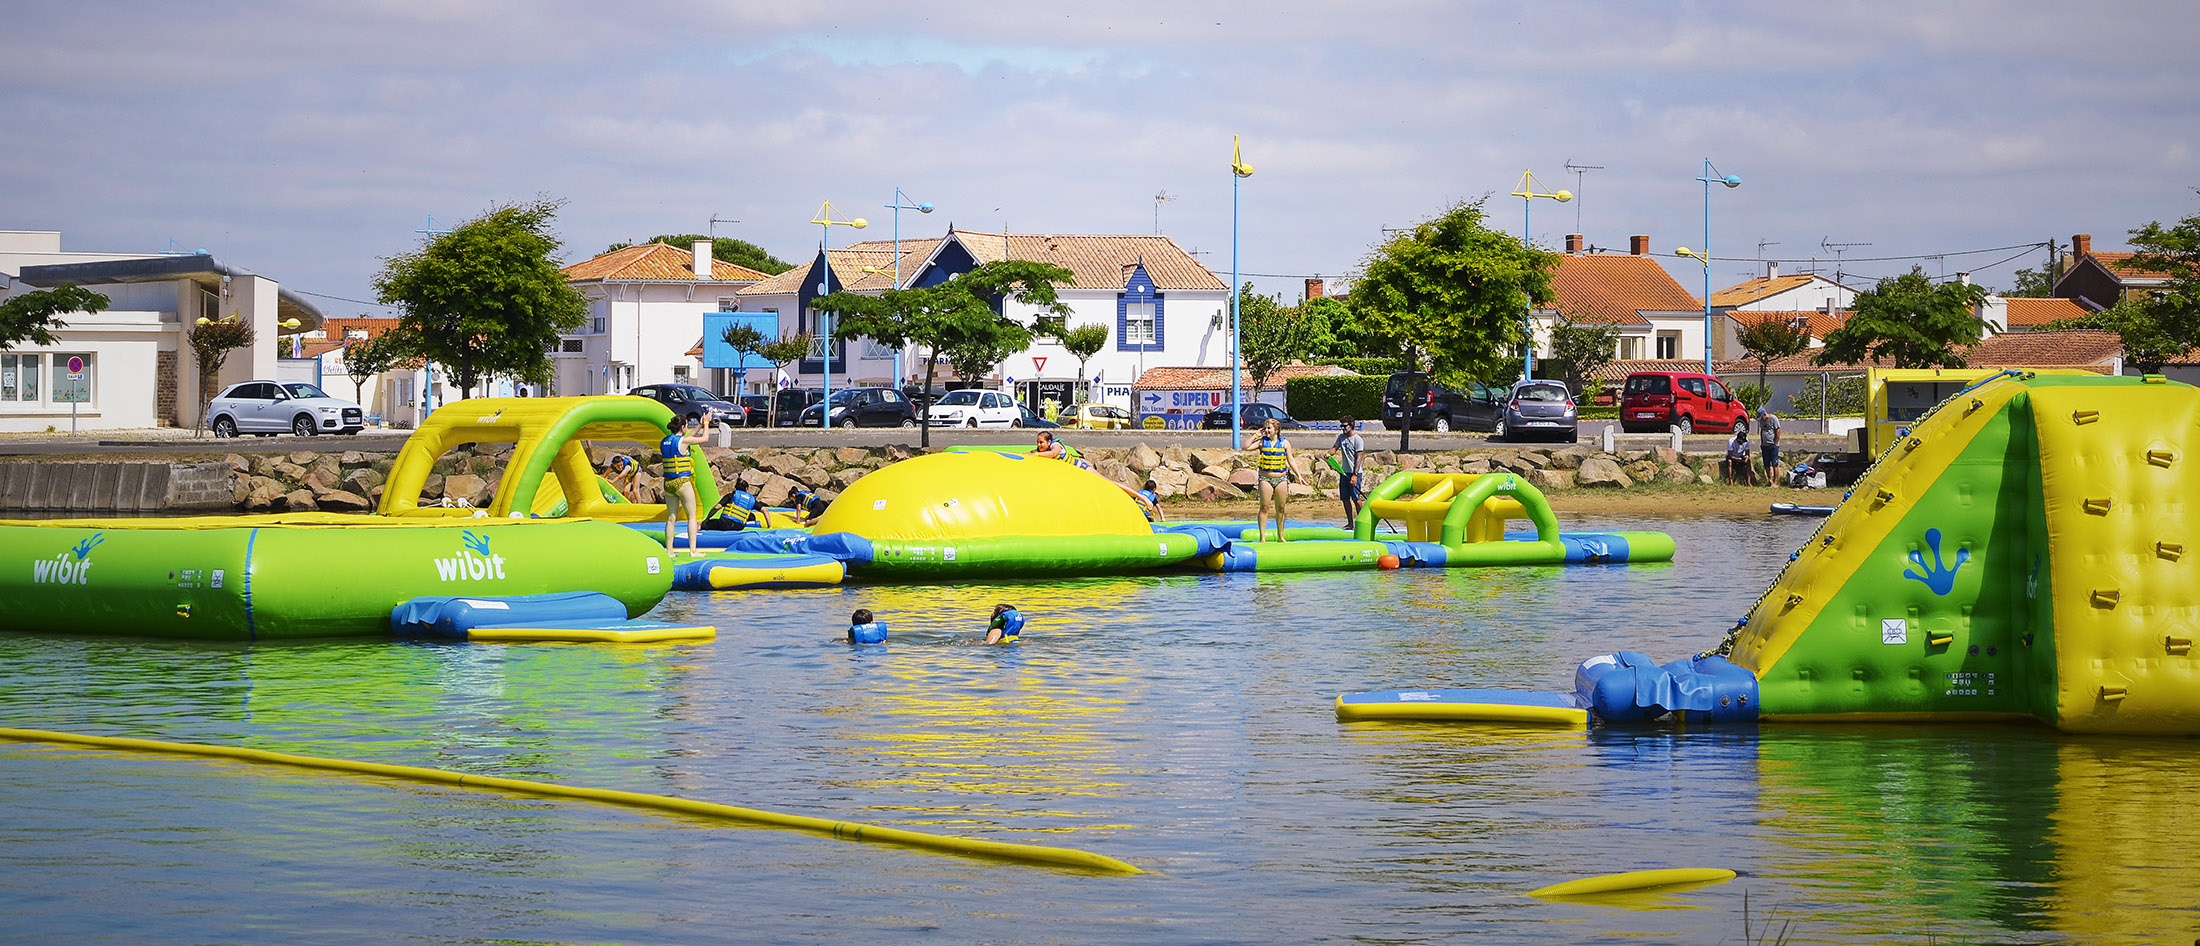 Parc aquatique Vendée